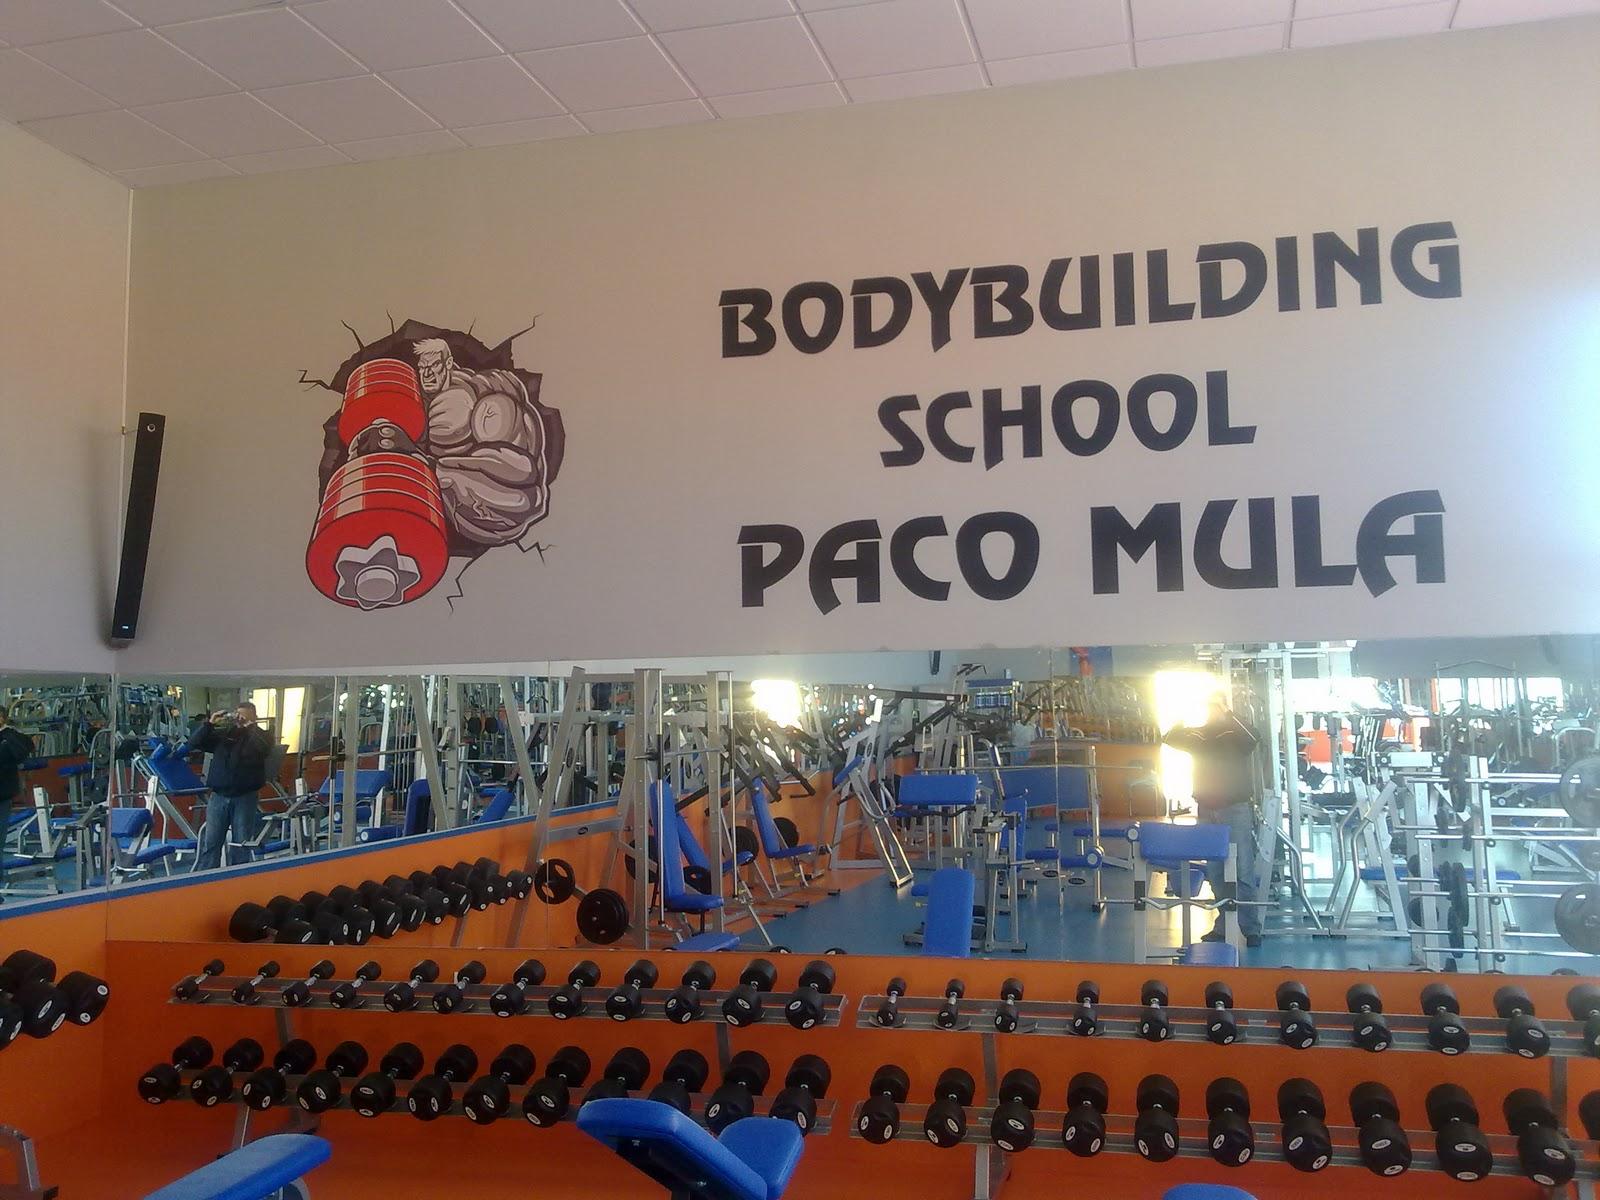 Gimnasio budybuilding school paco mula almer a bullbock - Gimnasio paredes ...